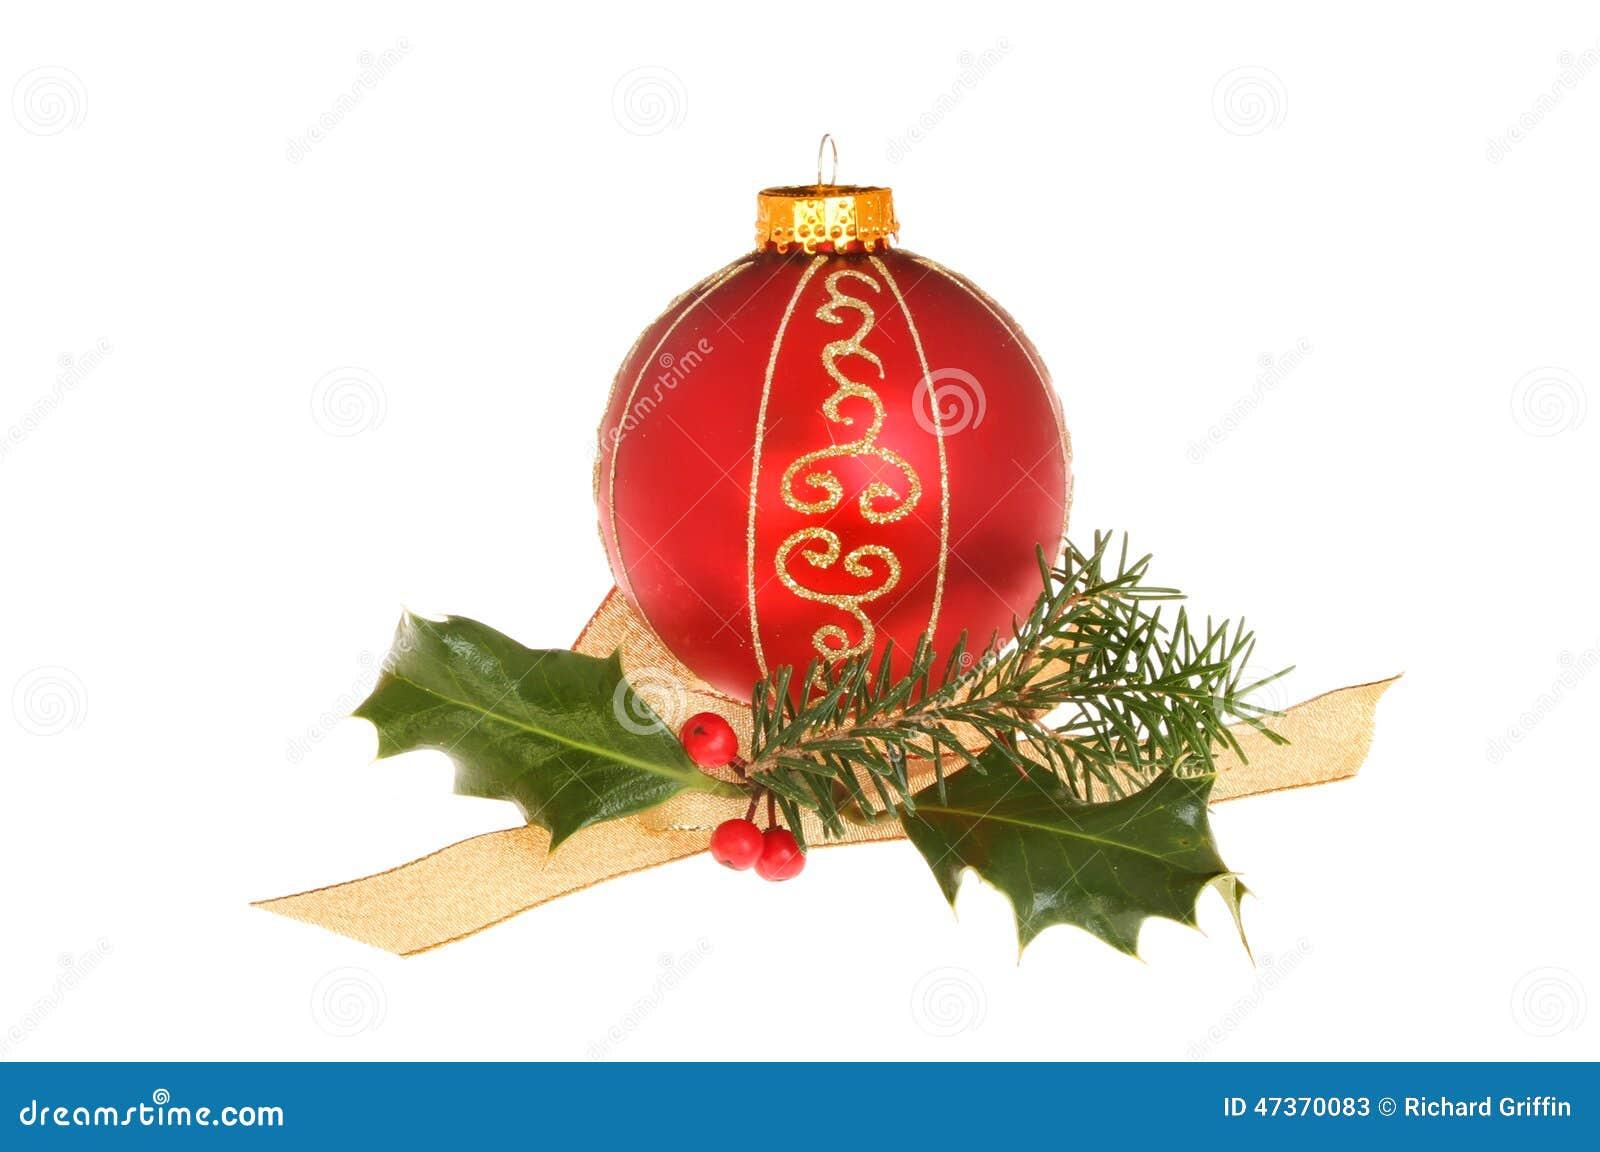 #AE221D Christmas Decoration Stock Photo Image: 47370083 6361 décoration noel commerce 1300x953 px @ aertt.com